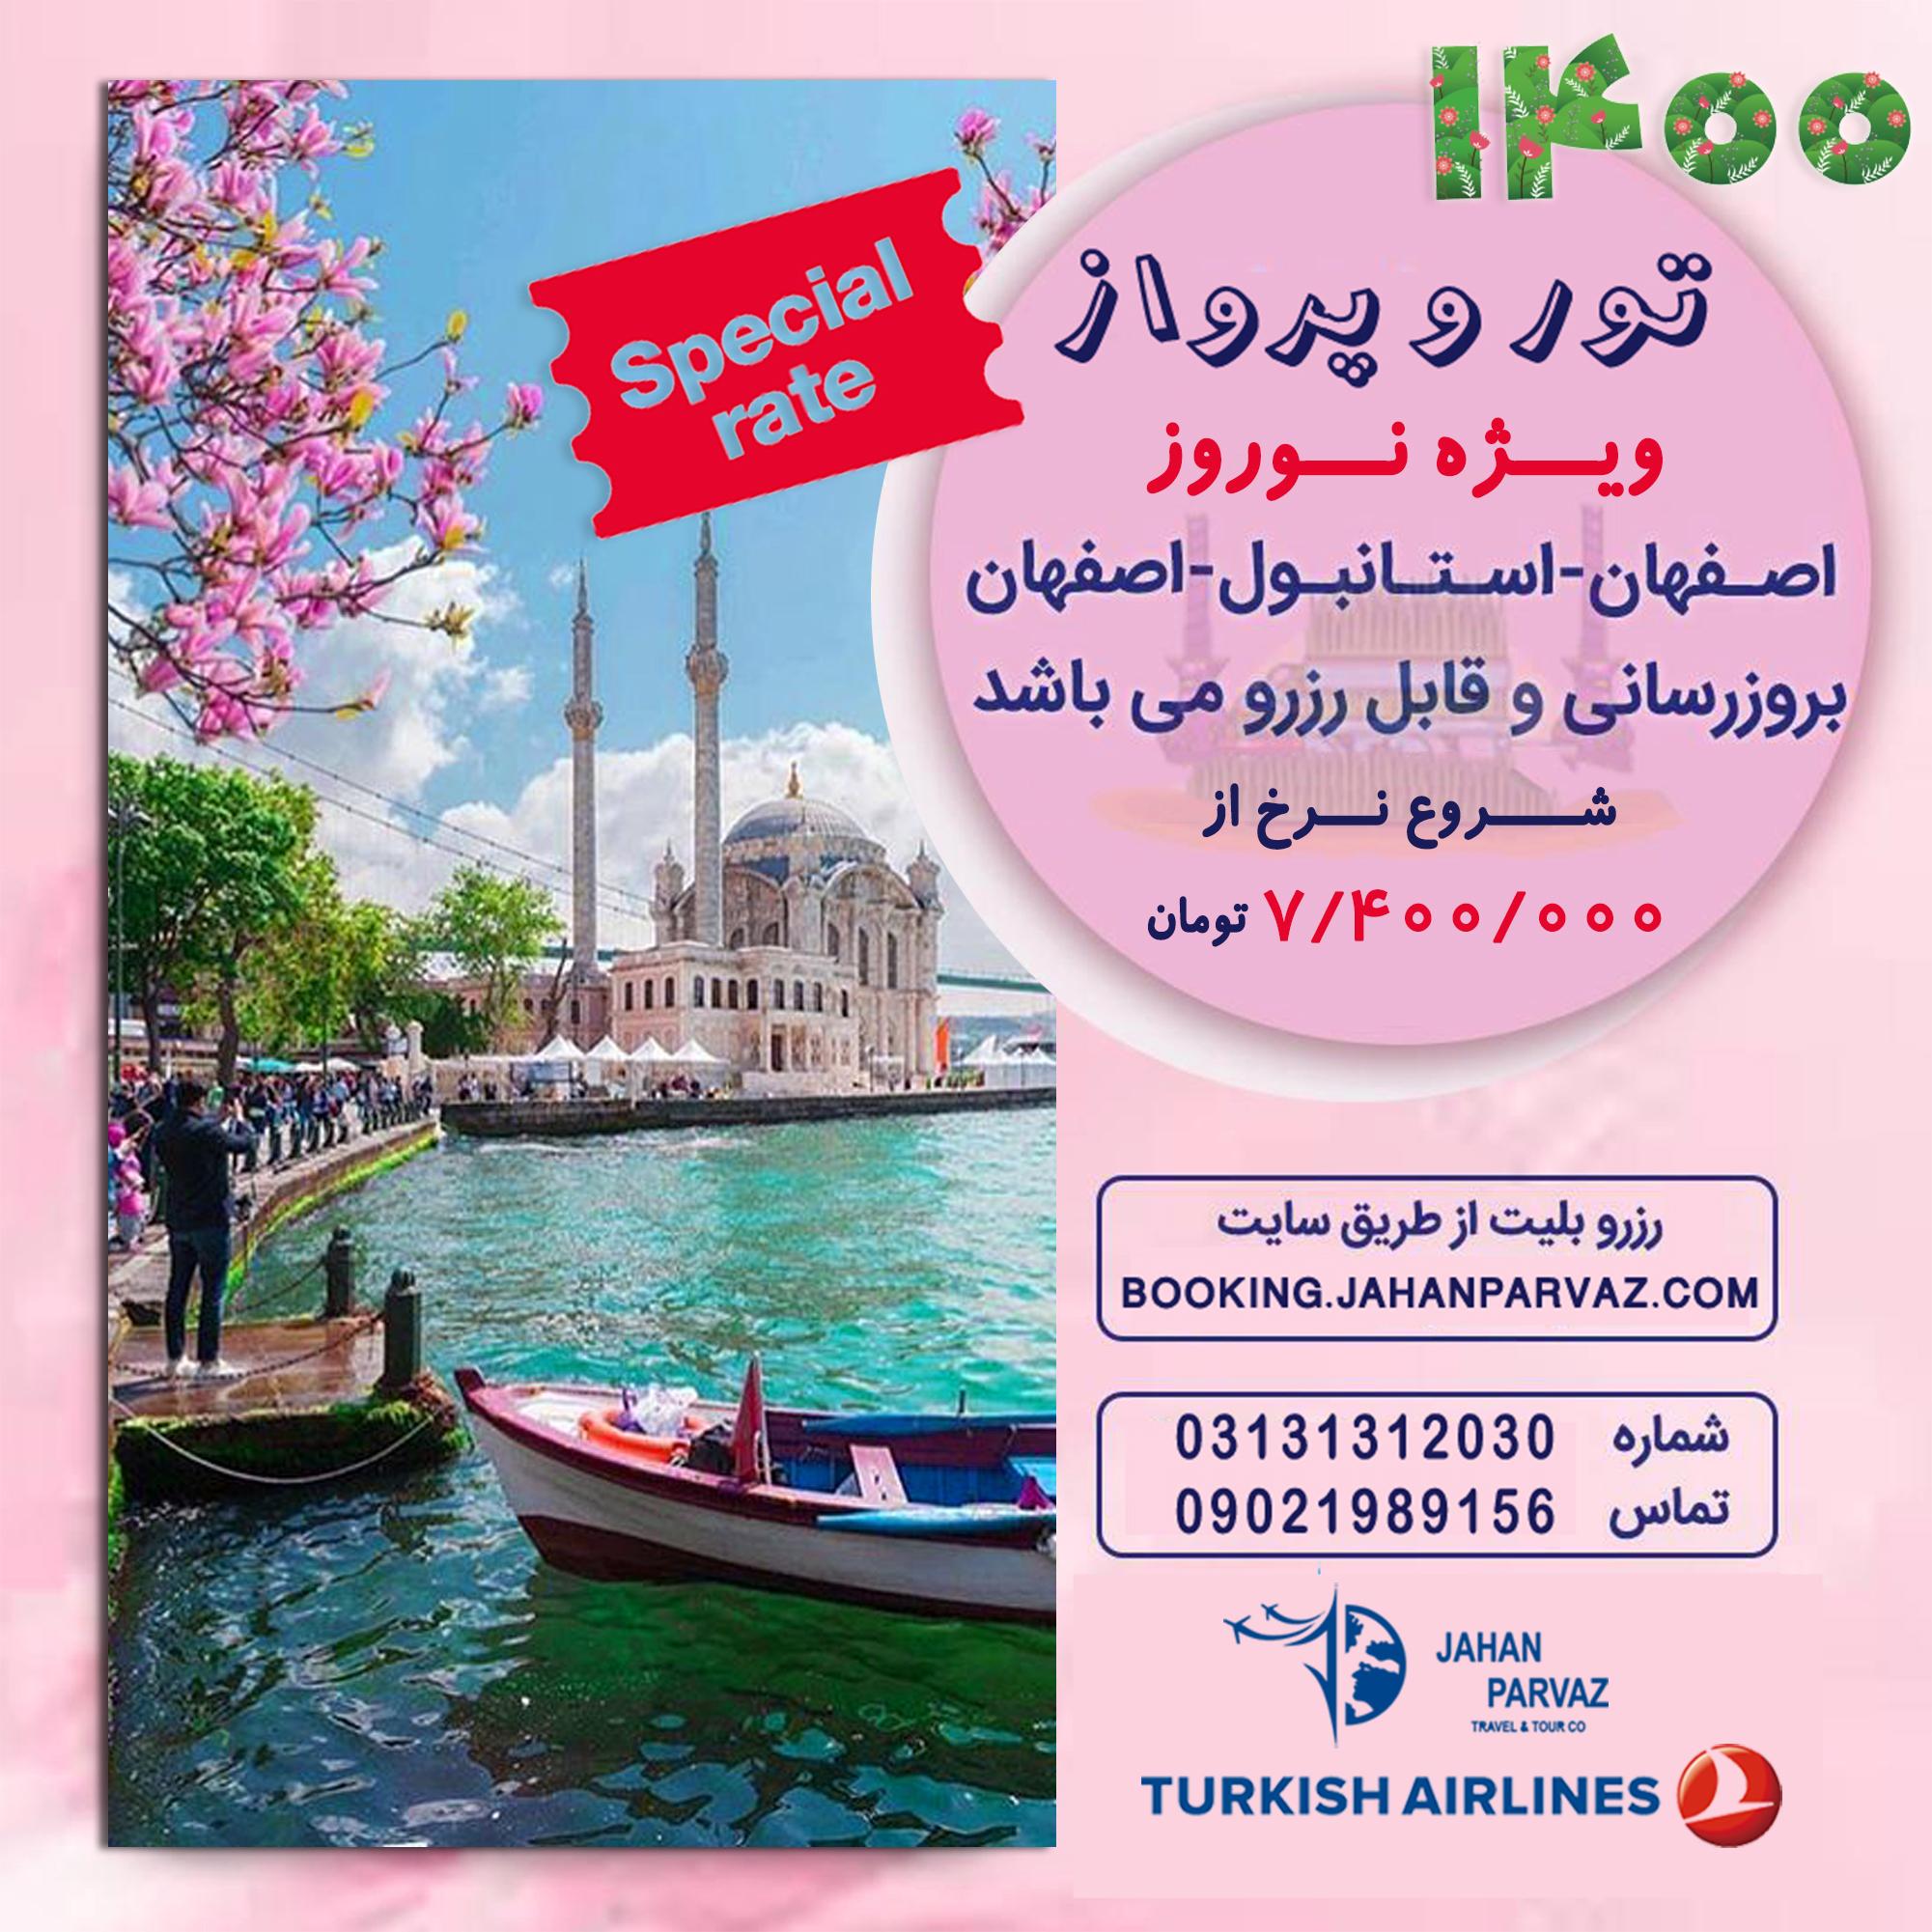 ✳️کاهش نرخ پروازهای ترکیش در مسیر اصفهان_استانبول_اصفهان 🎉 ویژه نوروز 1400 _ جهان پرواز